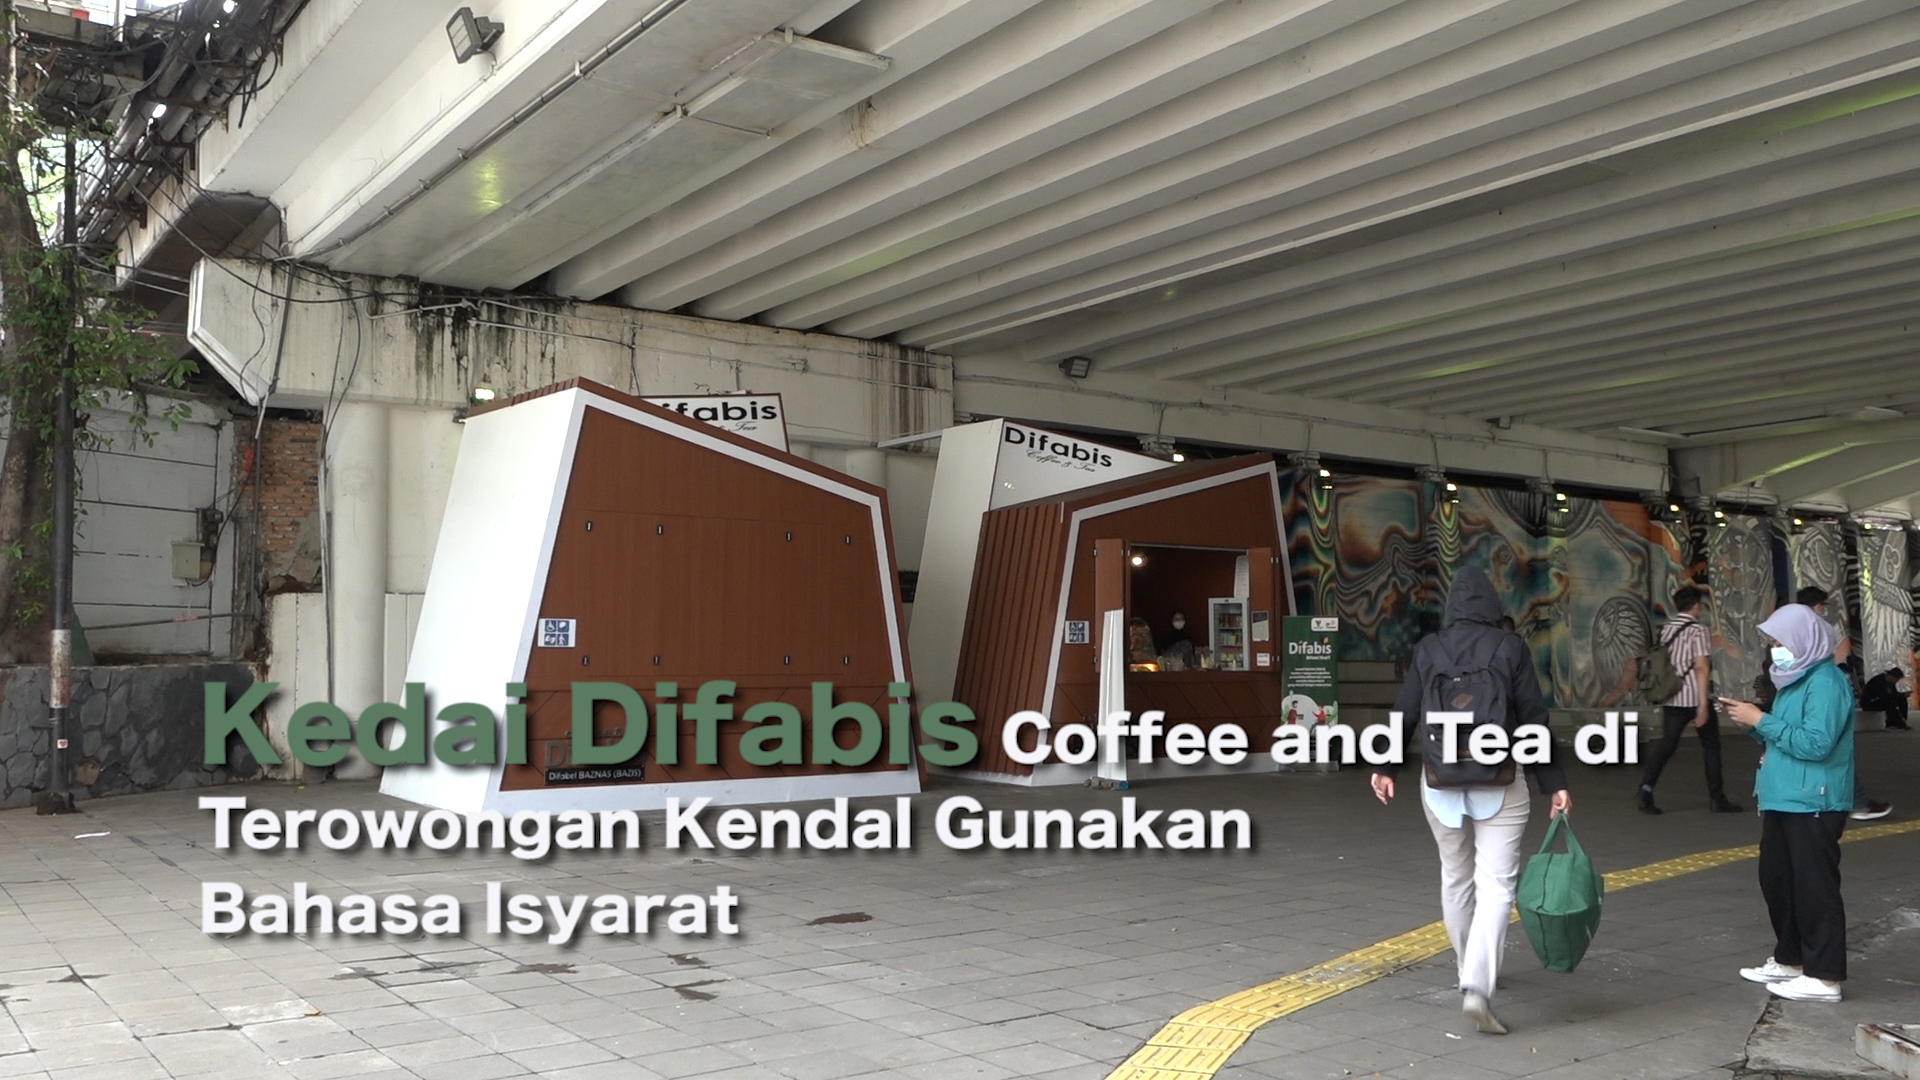 1102_YOANA_Kedai Difabis Coffee and Tea di Terowongan Kendal Gunakan Bahasa Isyarat.mp4